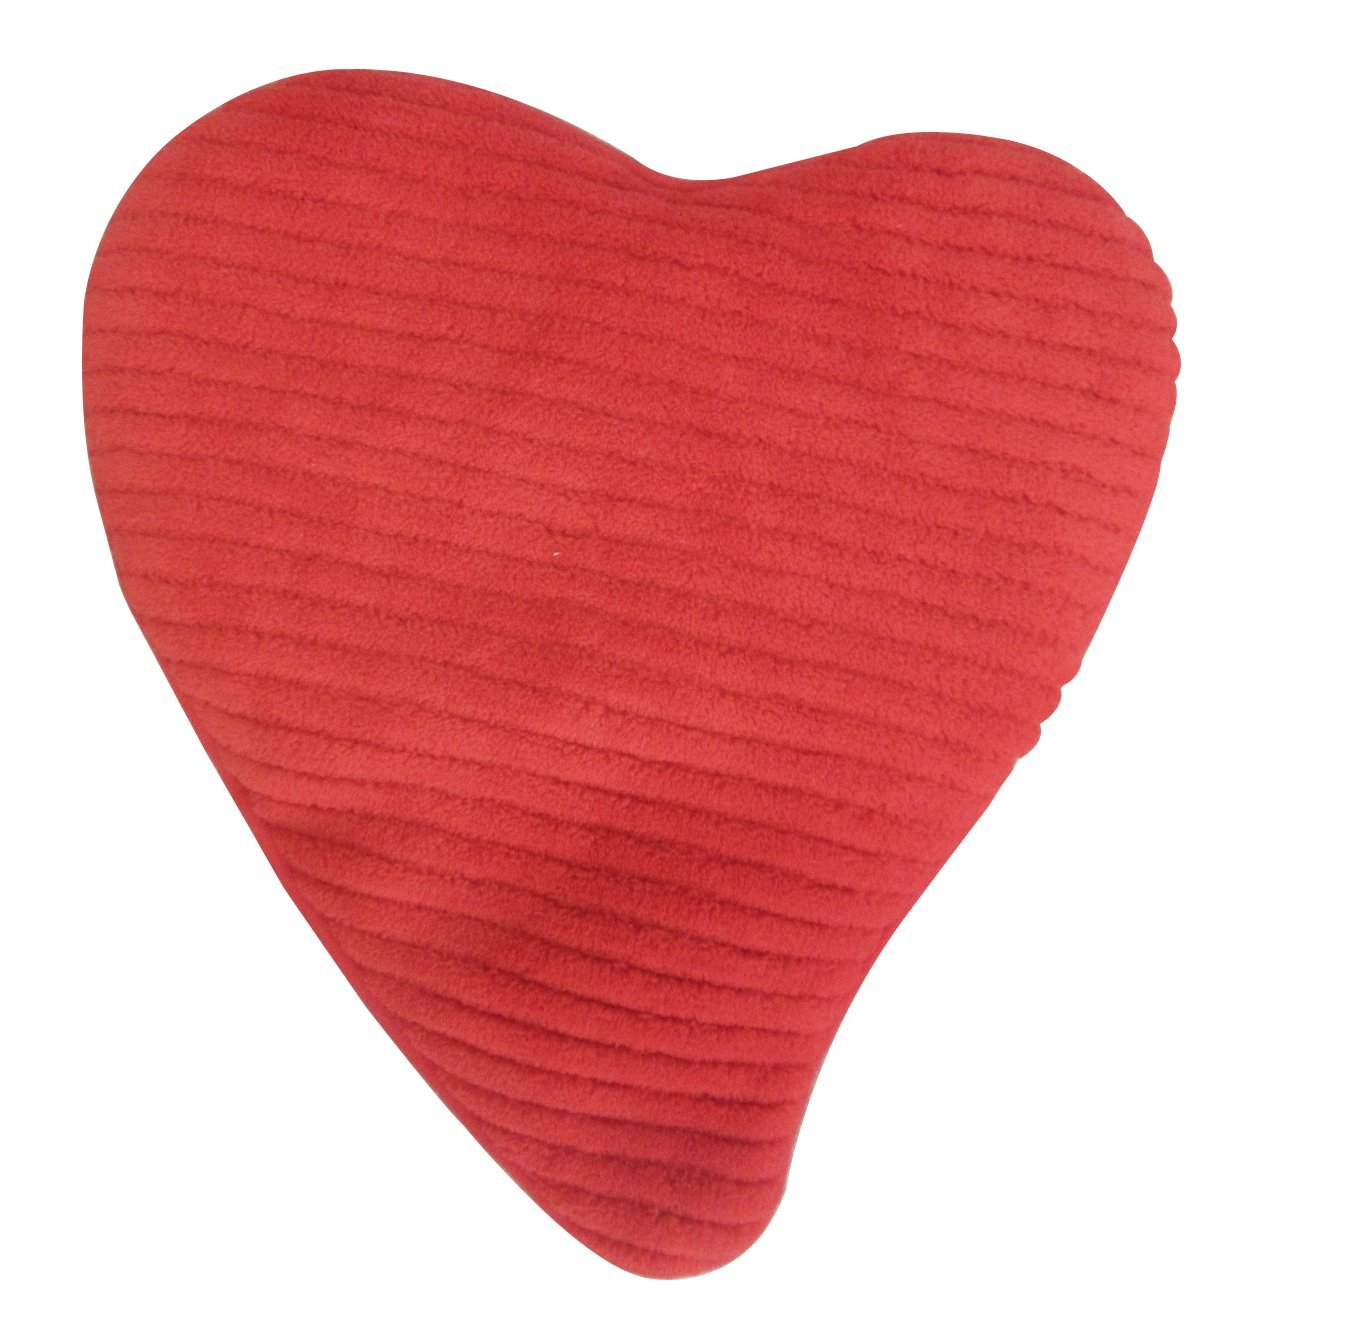 Intelex Spa Therapy Heart Plush, Red